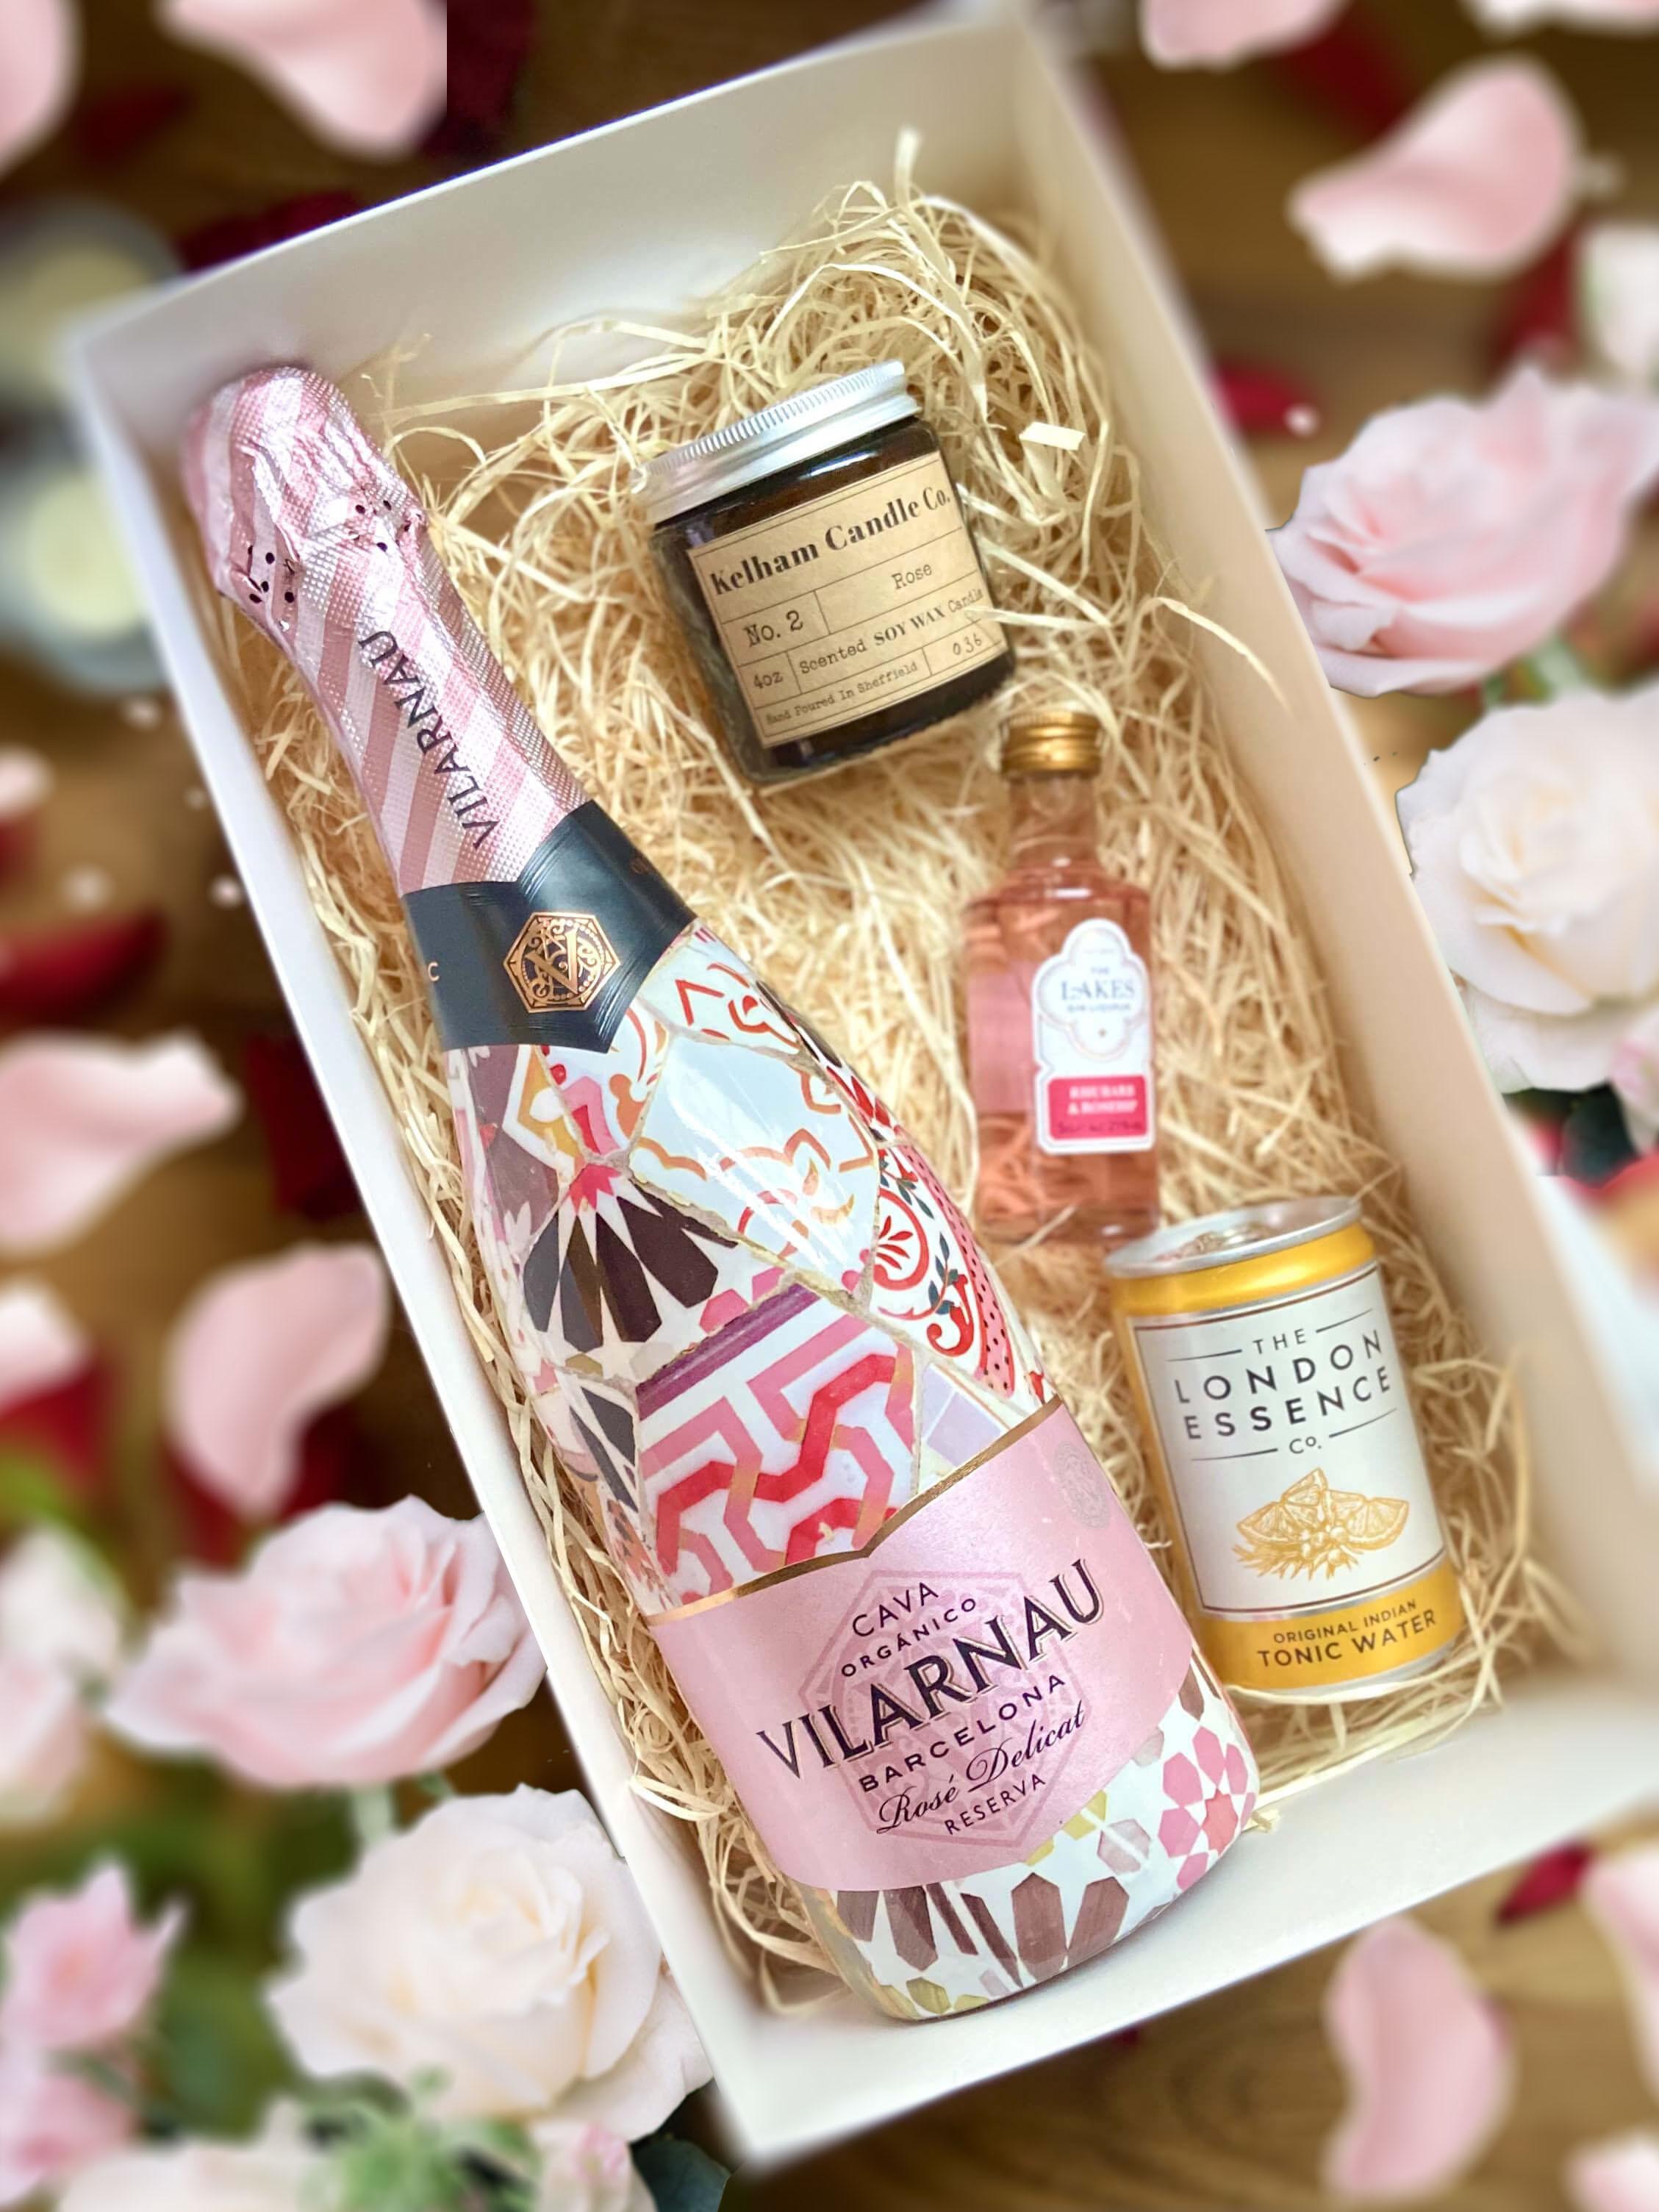 Vilarnau Rose Cava 75cl, 4oz Kelham Candle, Lakes Gin Rhubarb and Rosehip 5cl and London Essence Tonic can 150ml Set